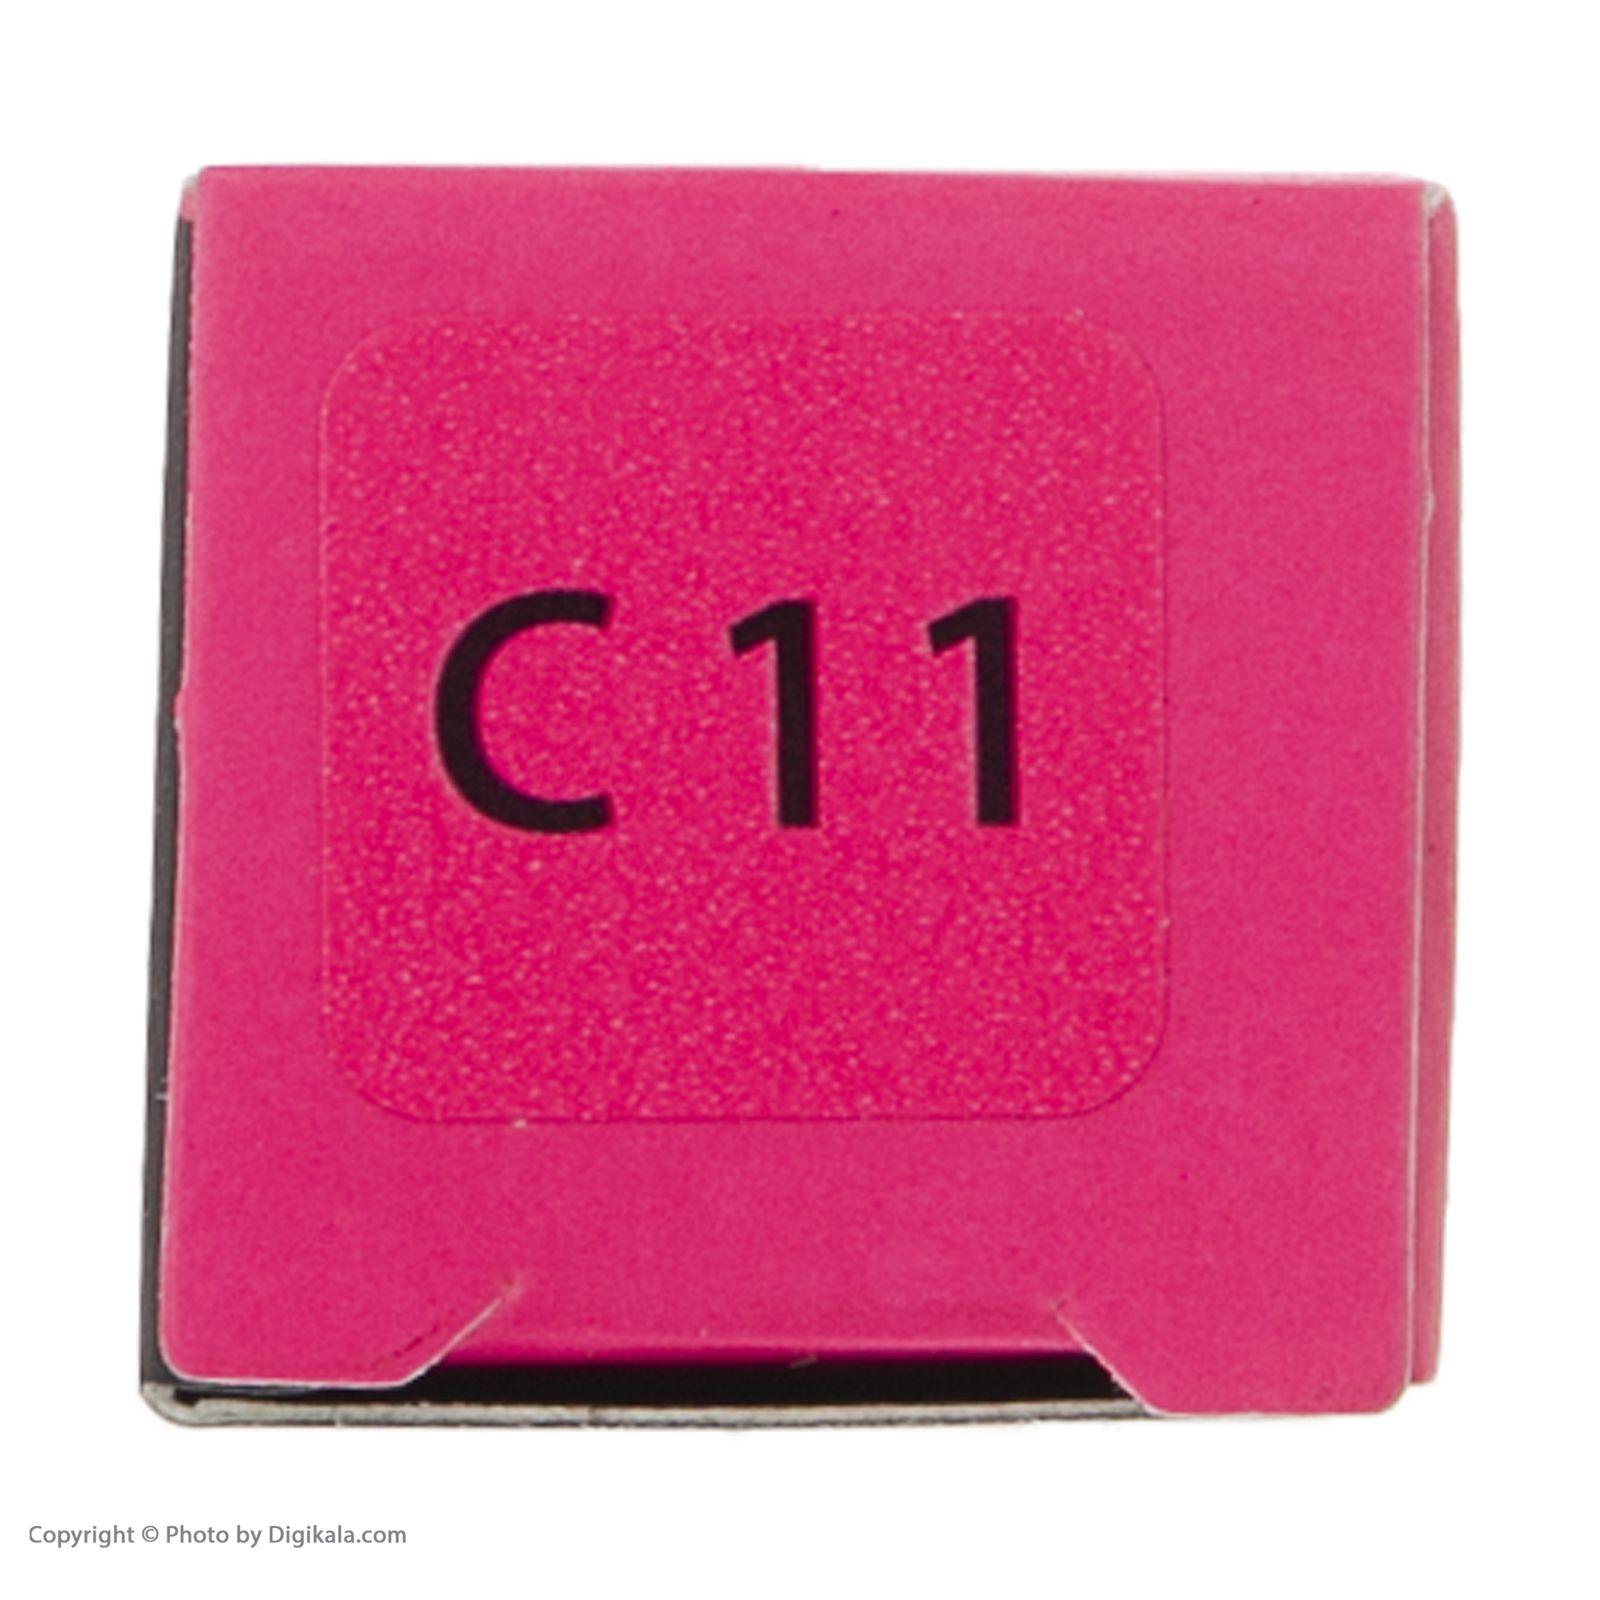 کانسیلر کالیستا مدل Cover Up شماره C11 -  - 4